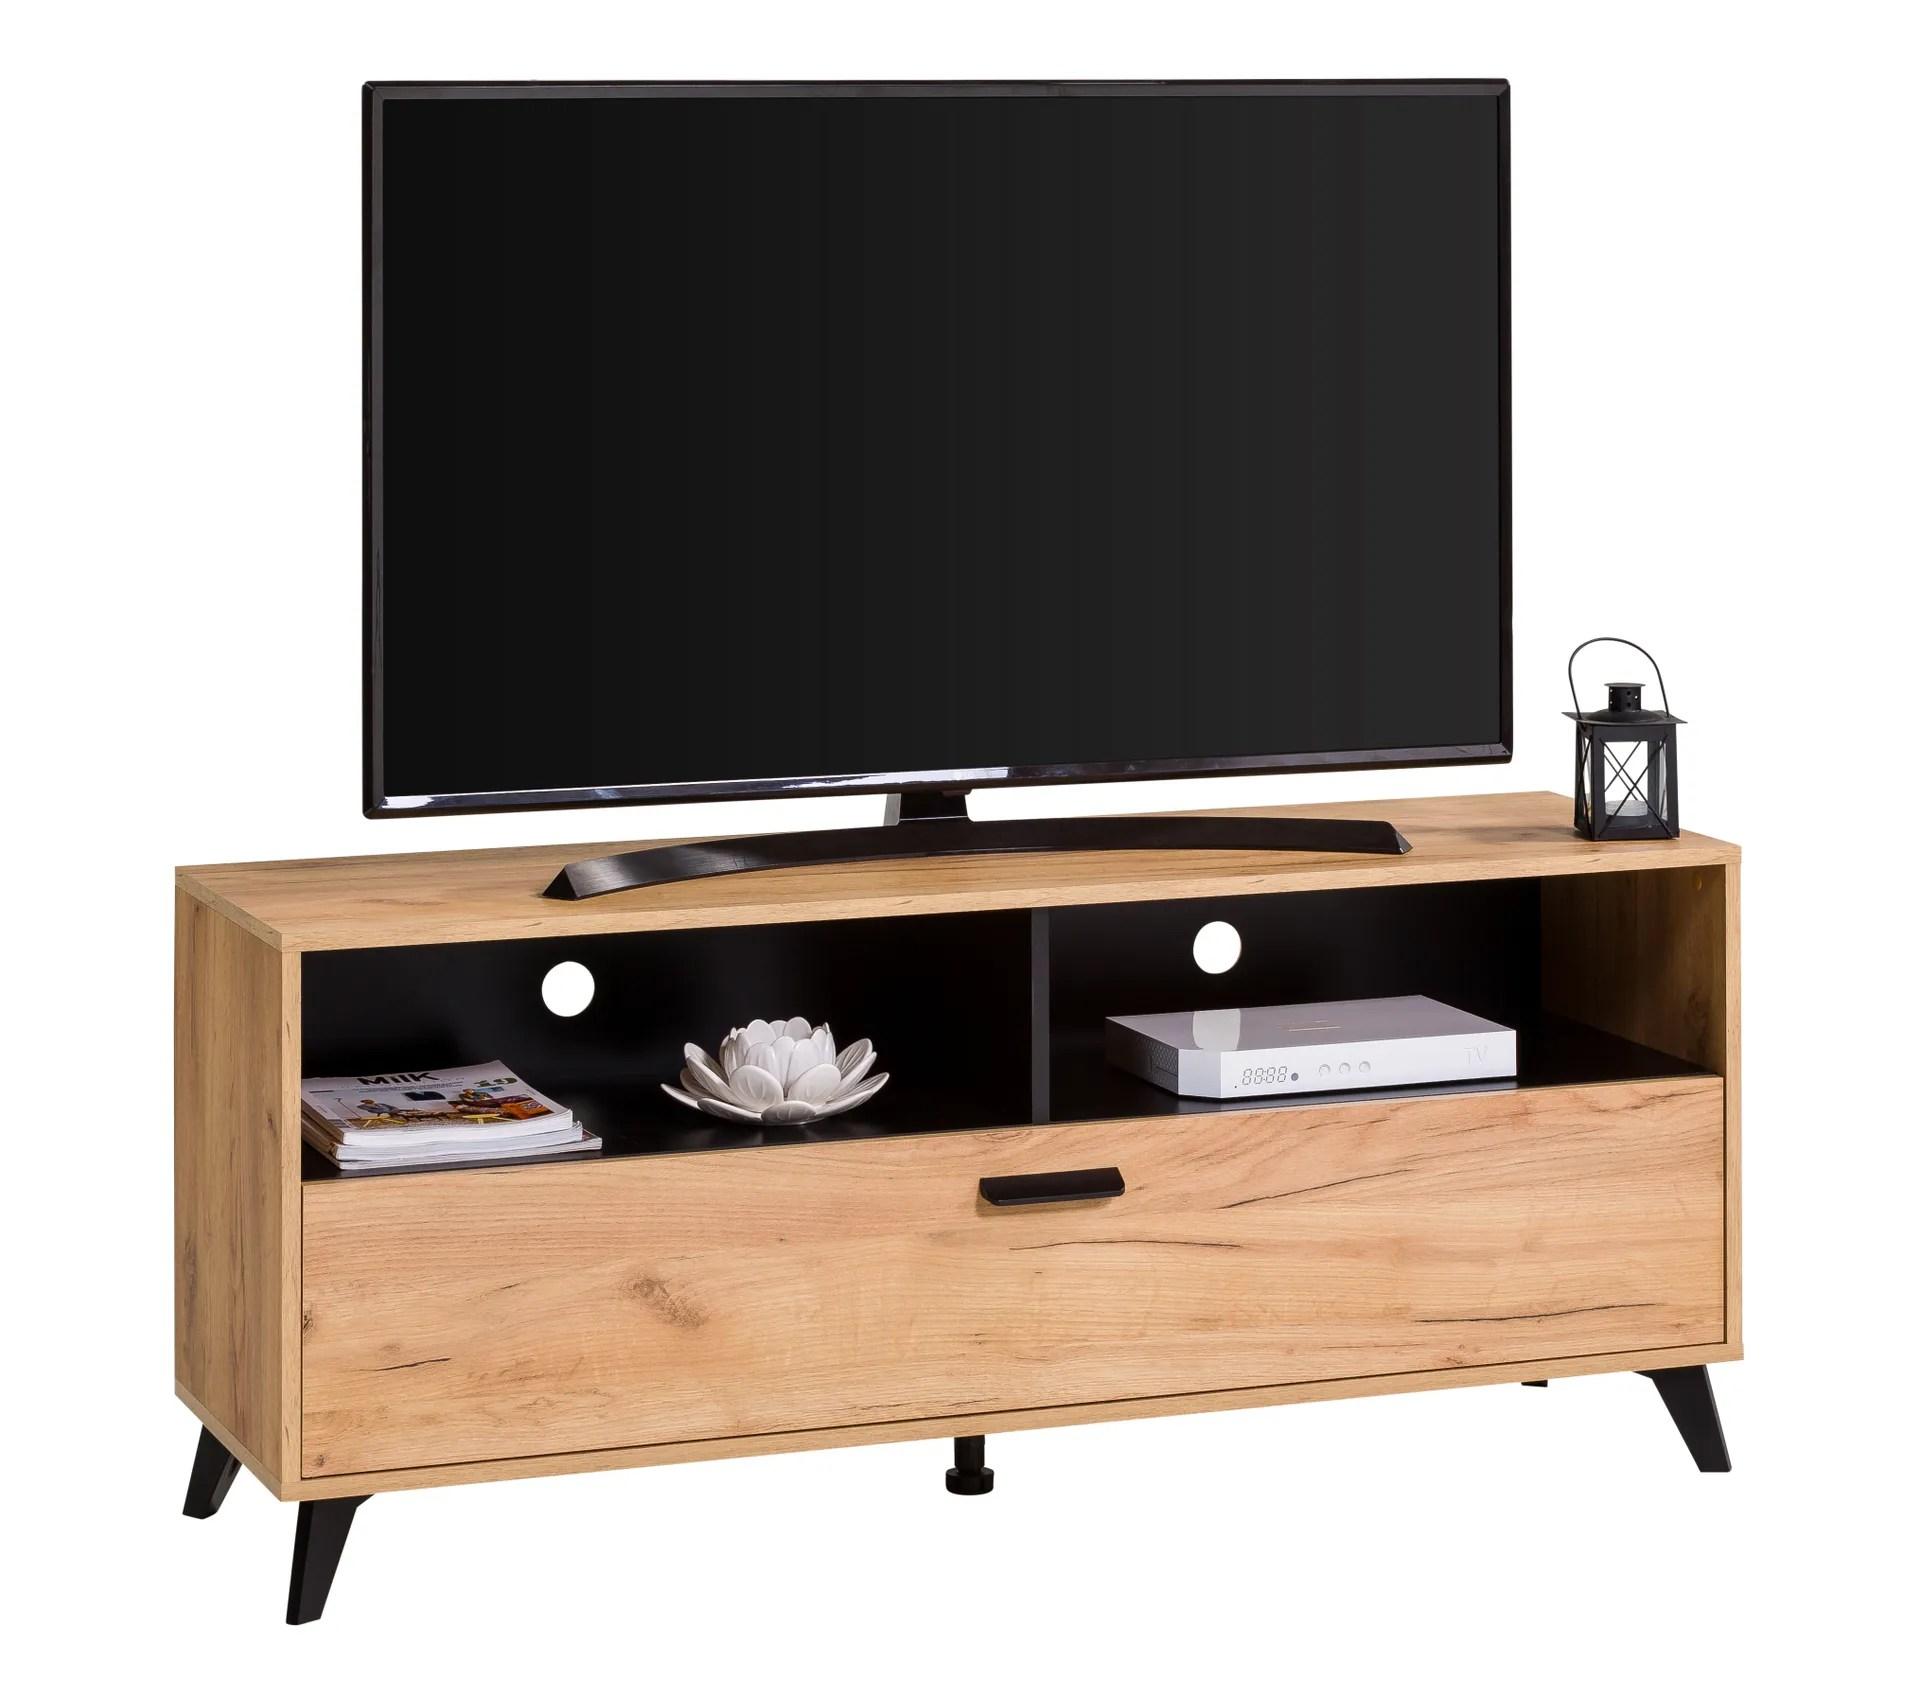 meuble tv industriel umbria decor imitation chene noir